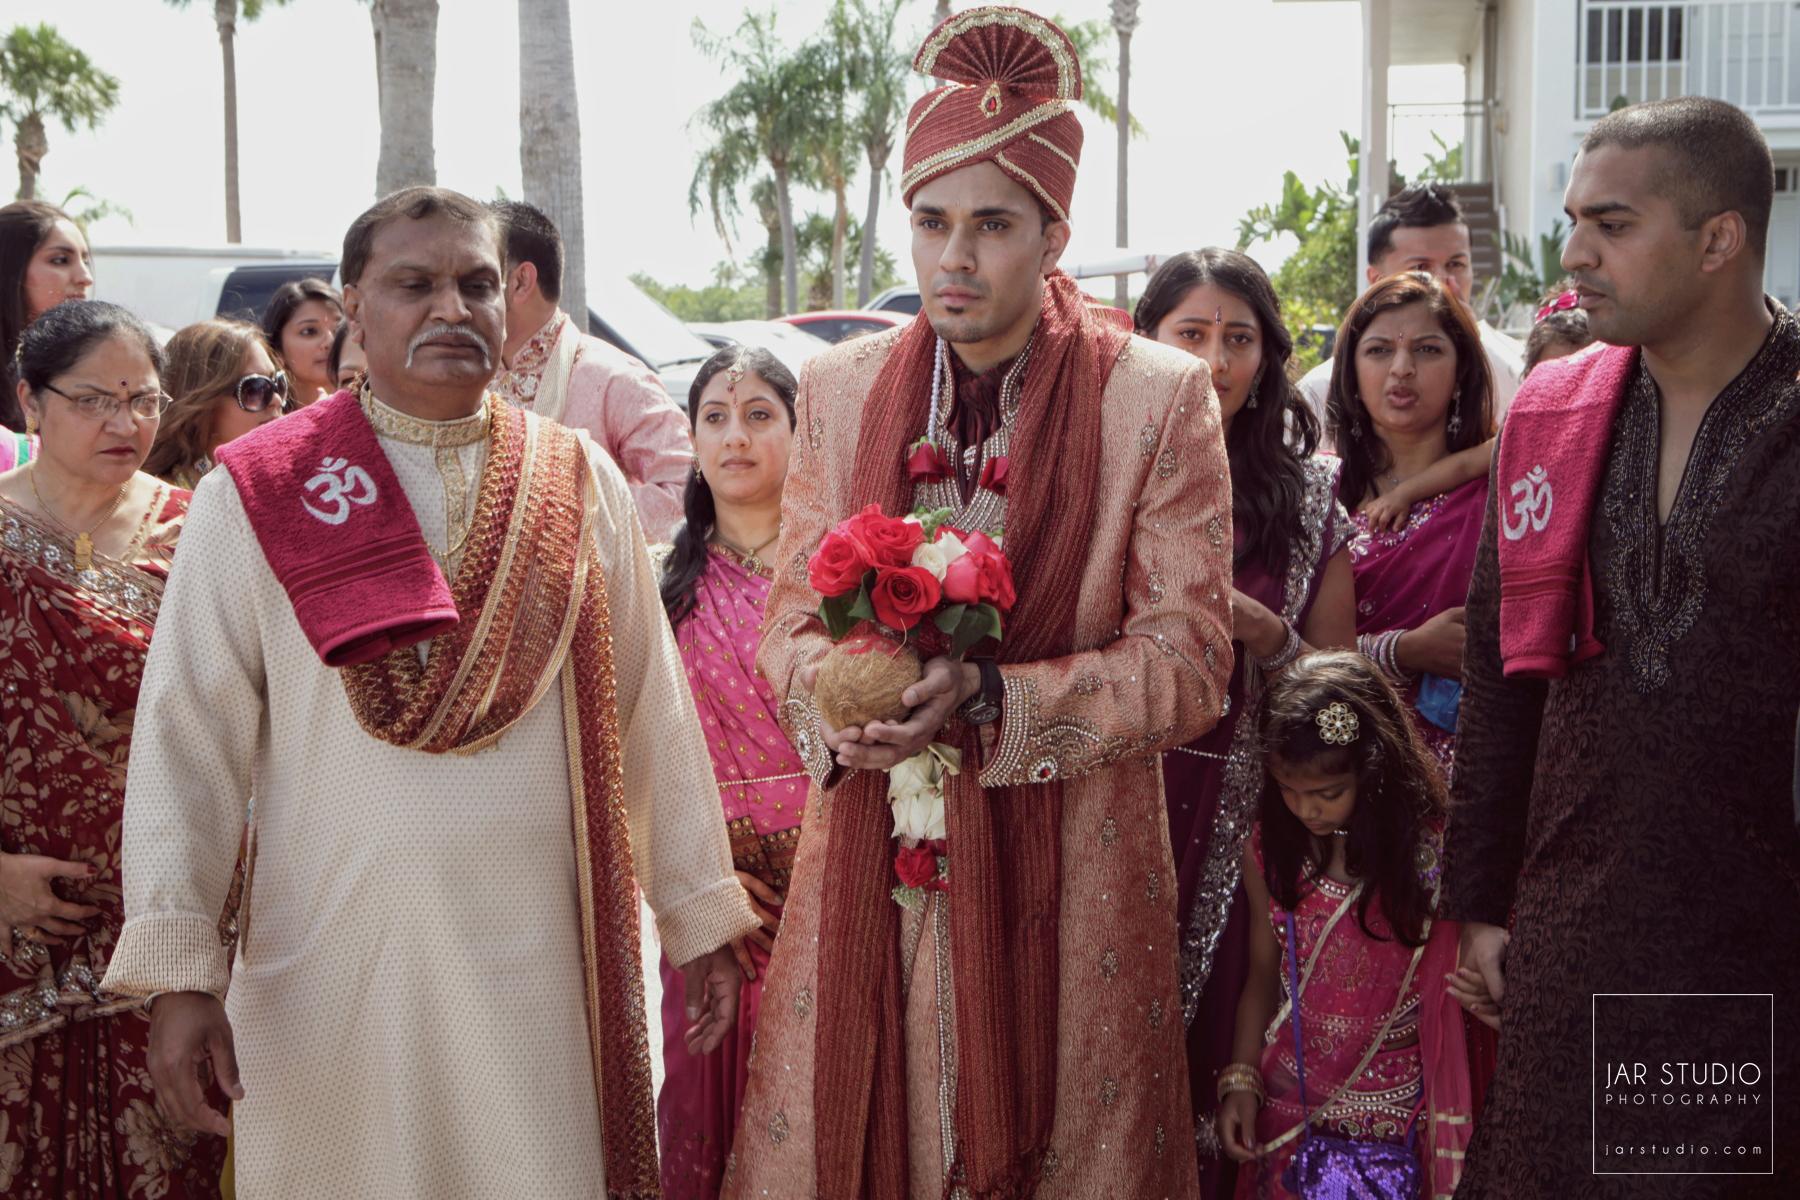 30-hindu-family-wedding-jarstudio-photography-orlando.JPG